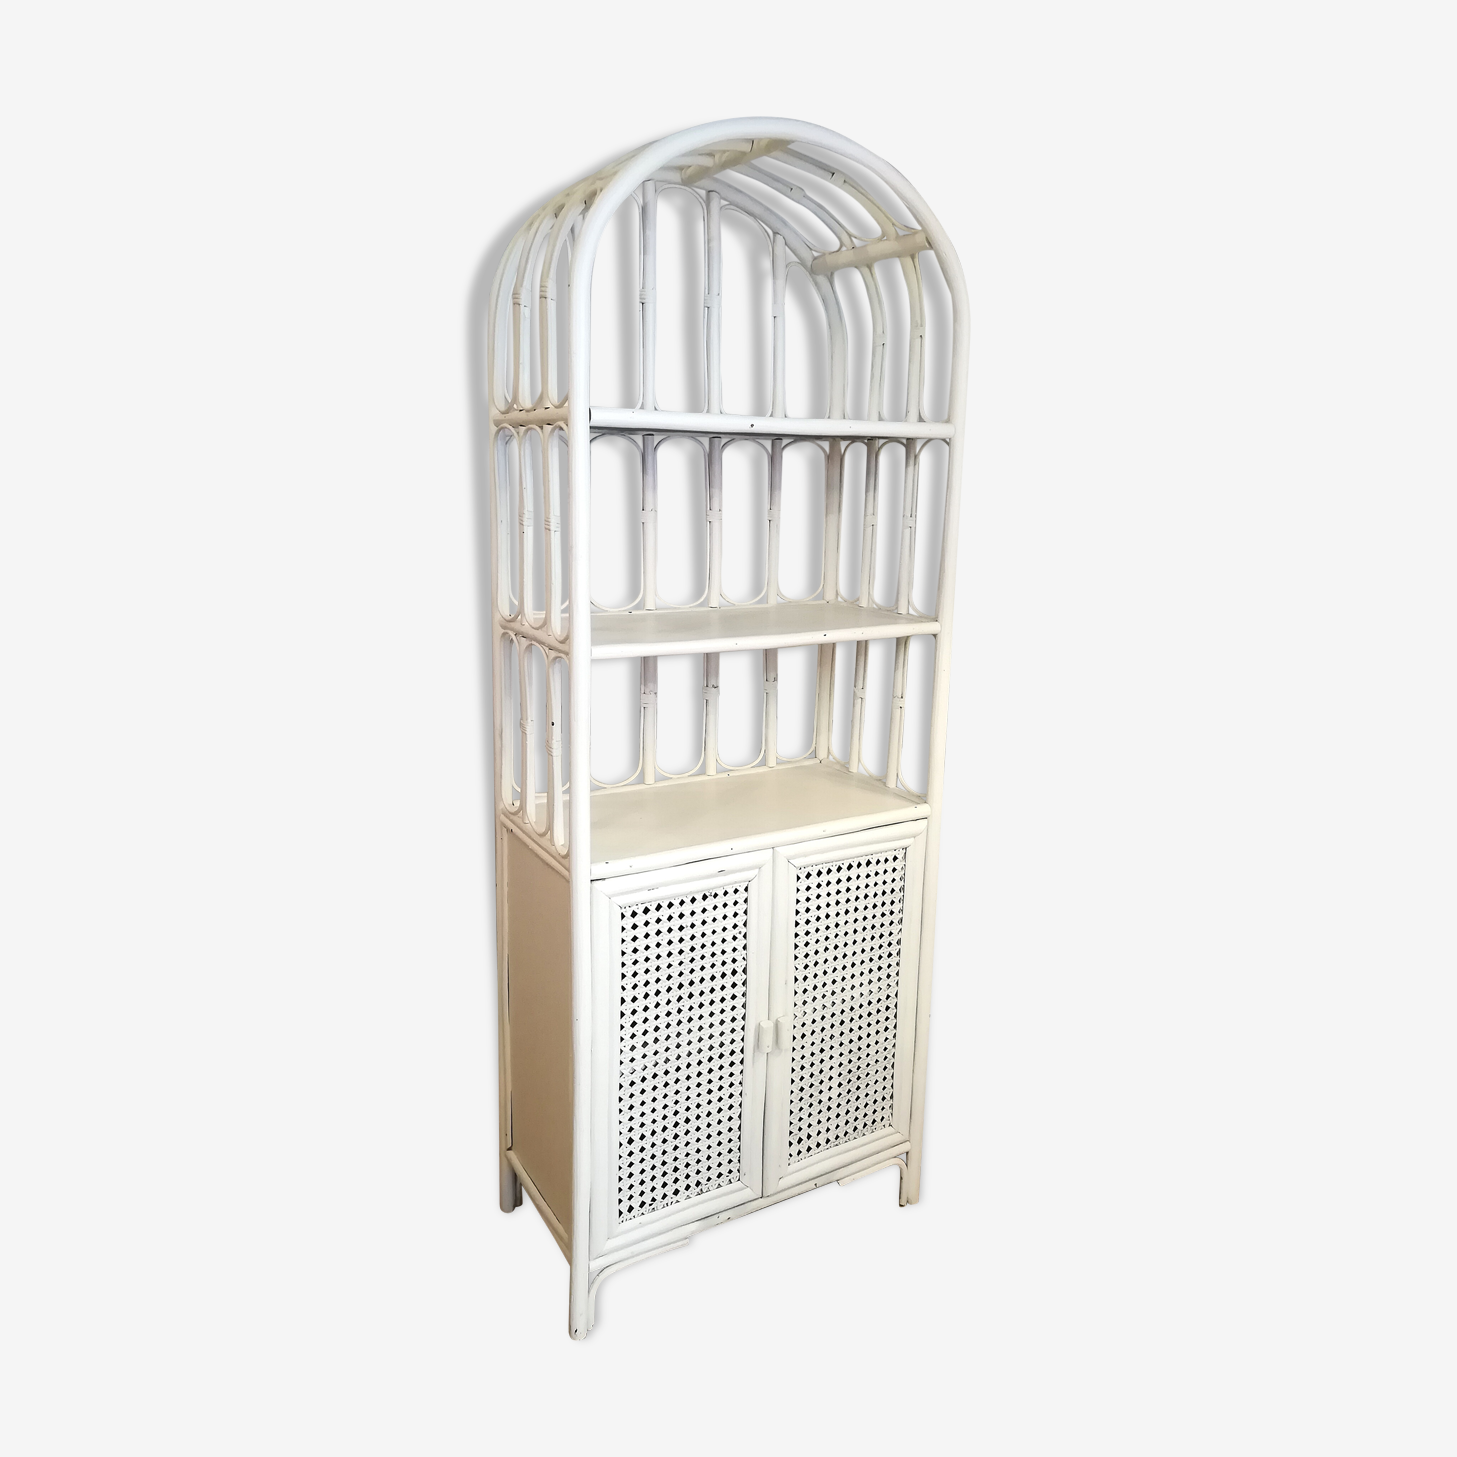 Bibliothèque rotin bambou blanc vintage